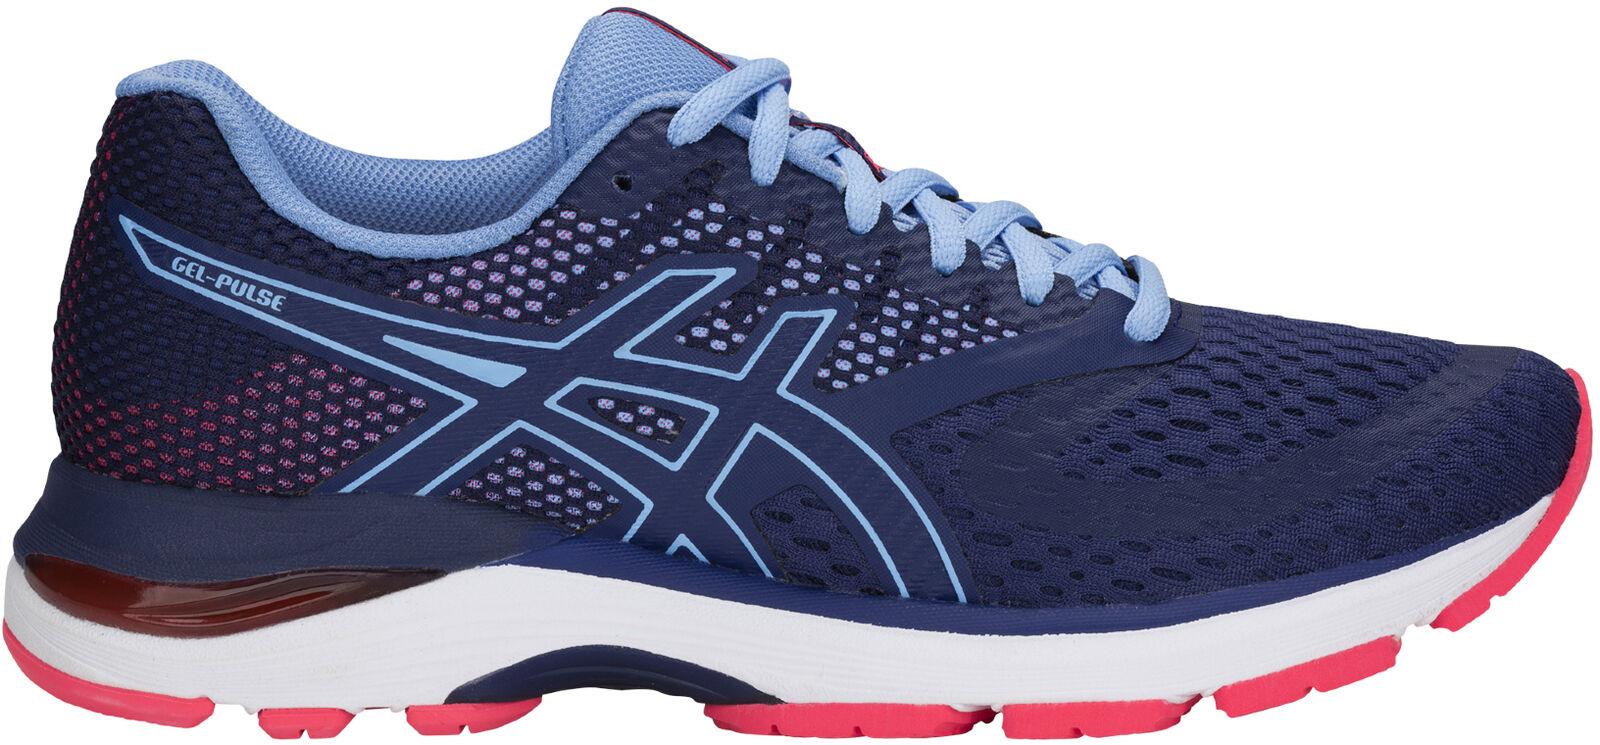 Asics Gel Pulse 10 Womens Running shoes - blueee